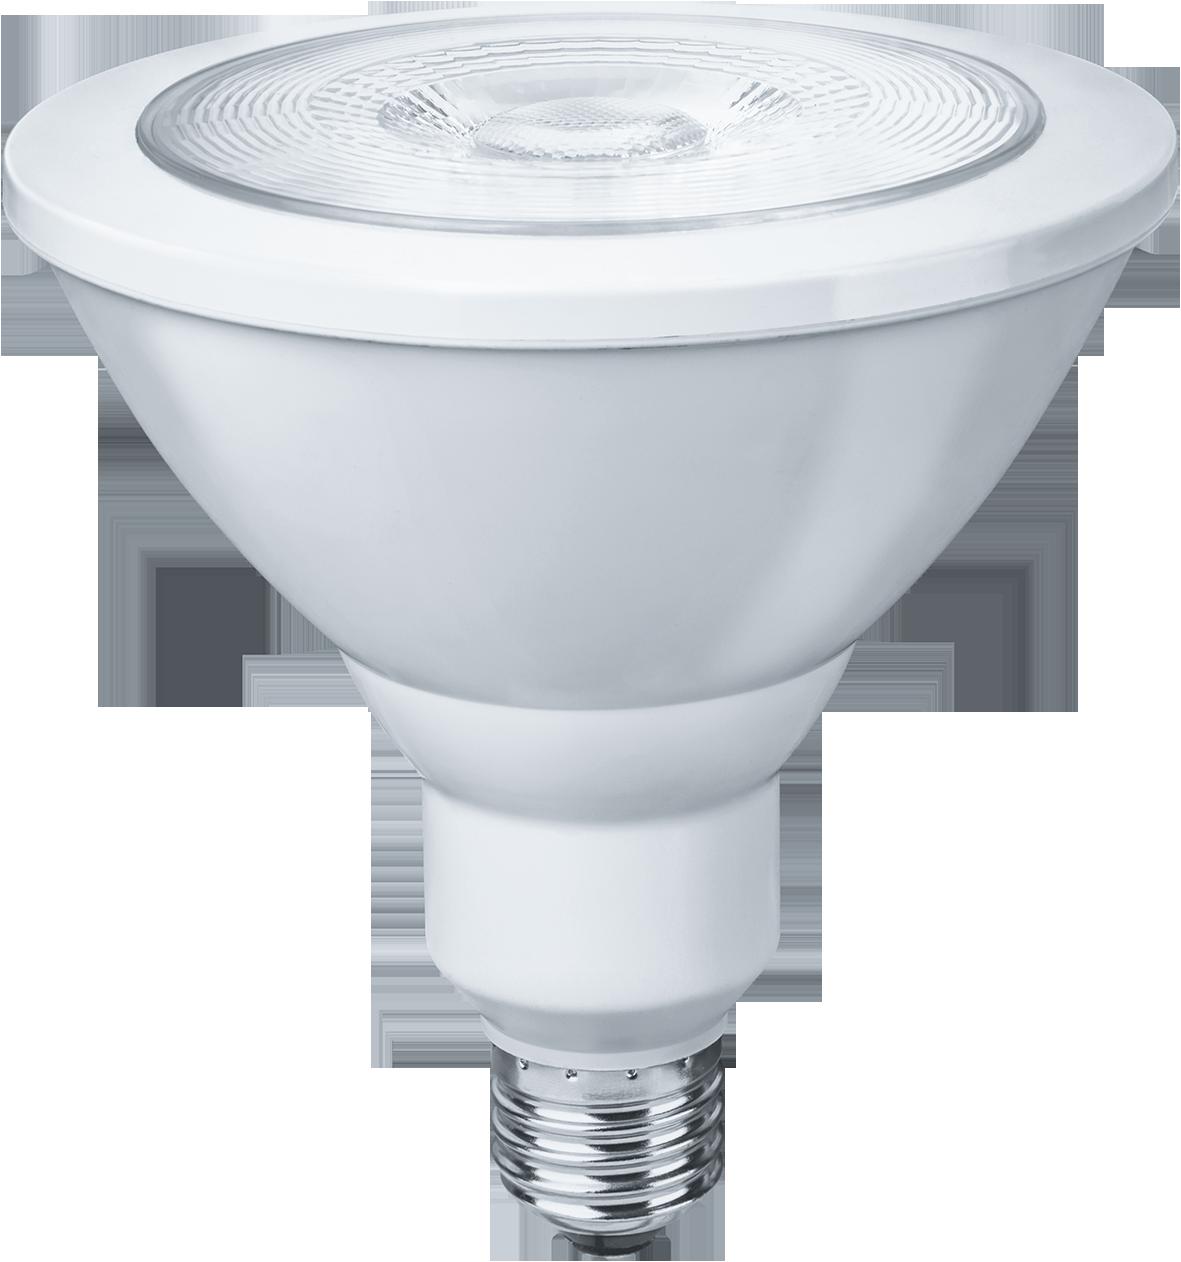 Лампа NLL-FITO-PAR38-15-230-E27 61 201 Navigator